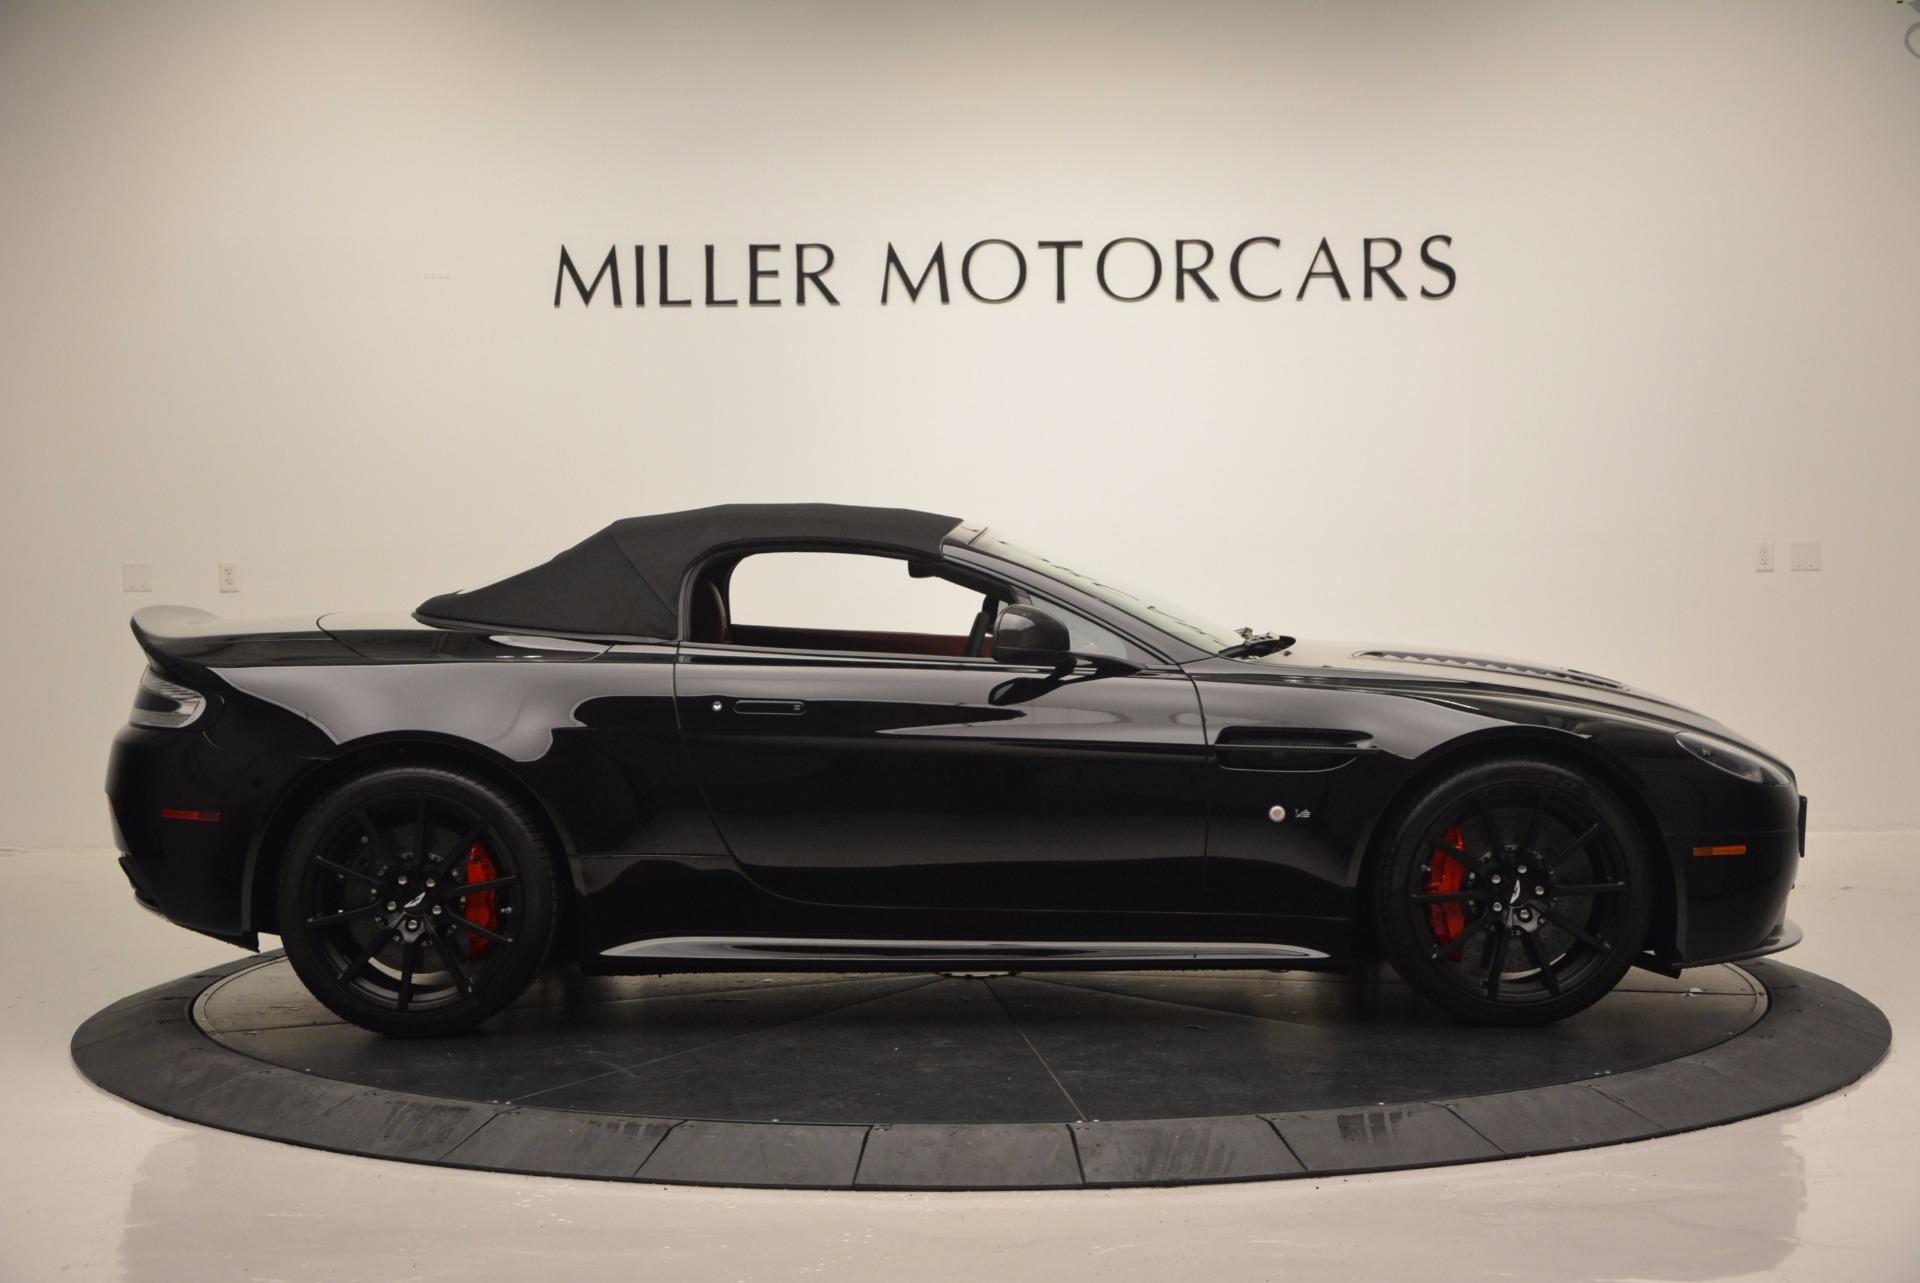 Used 2015 Aston Martin V12 Vantage S Roadster For Sale In Greenwich, CT. Alfa Romeo of Greenwich, 7227 1335_p15